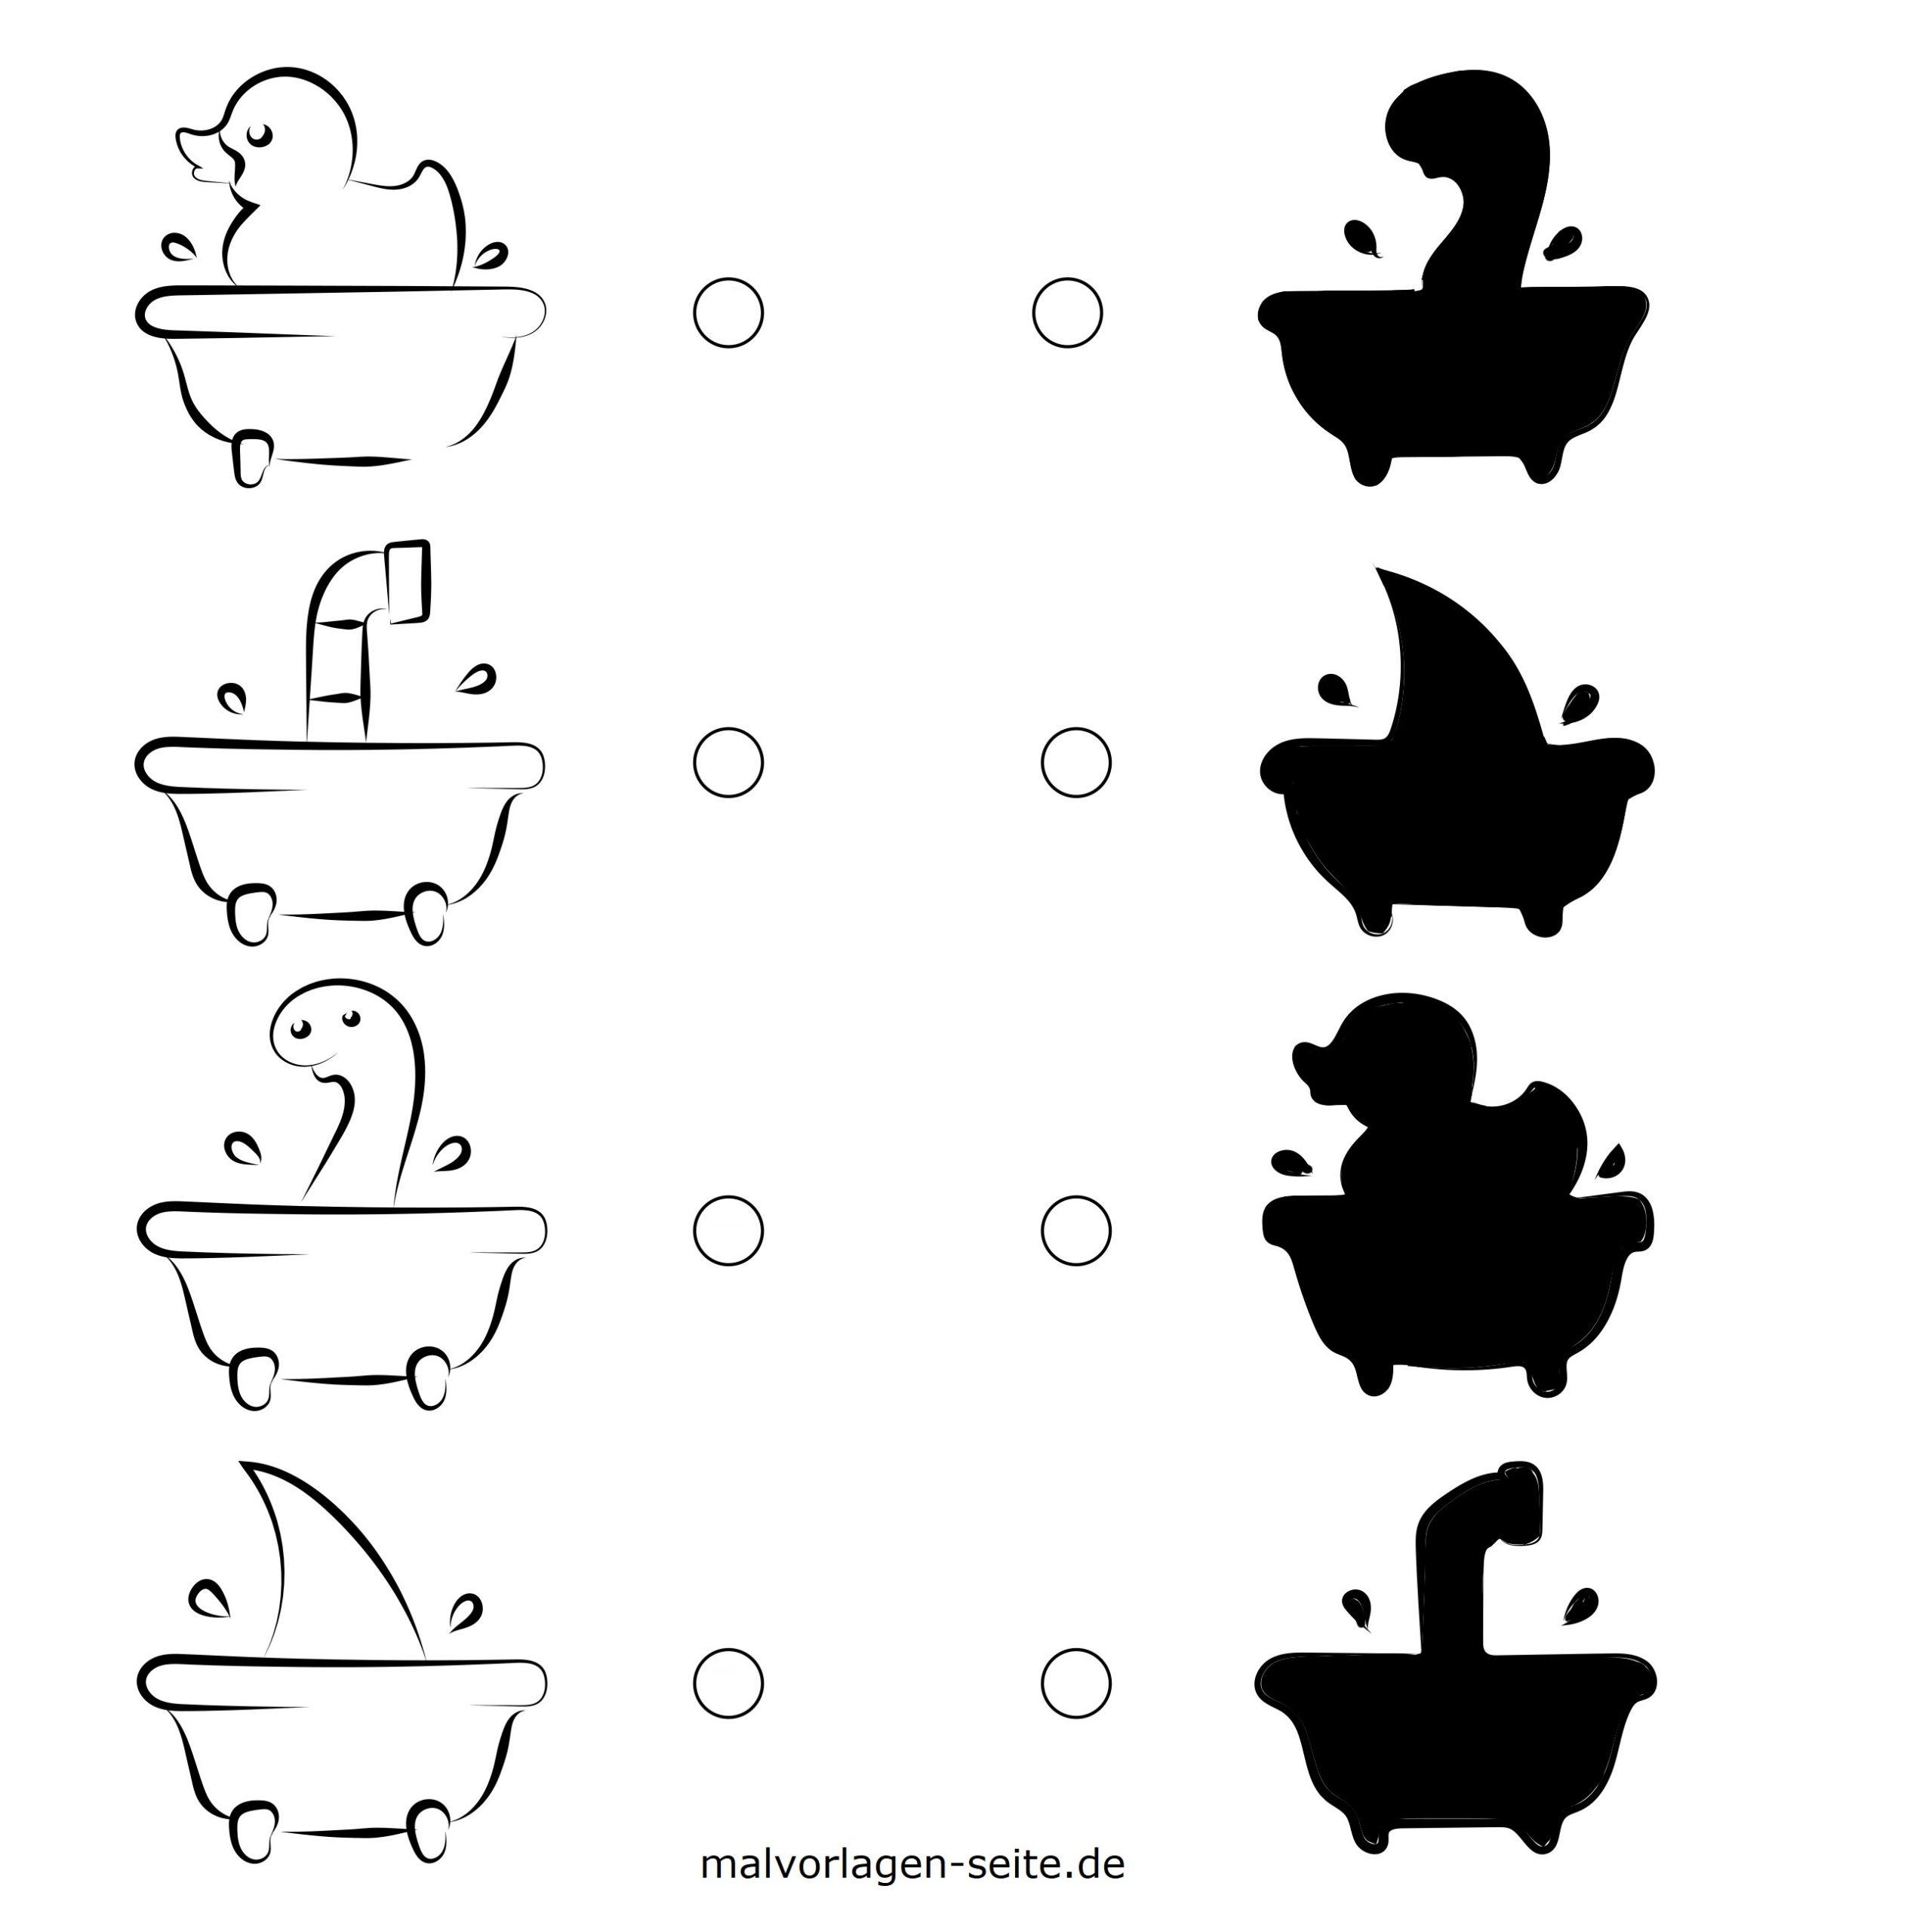 Schattenrätsel Für Kinder | Rätsel - Ausmalbilder Kostenlos bei Kinderrätsel Tiere